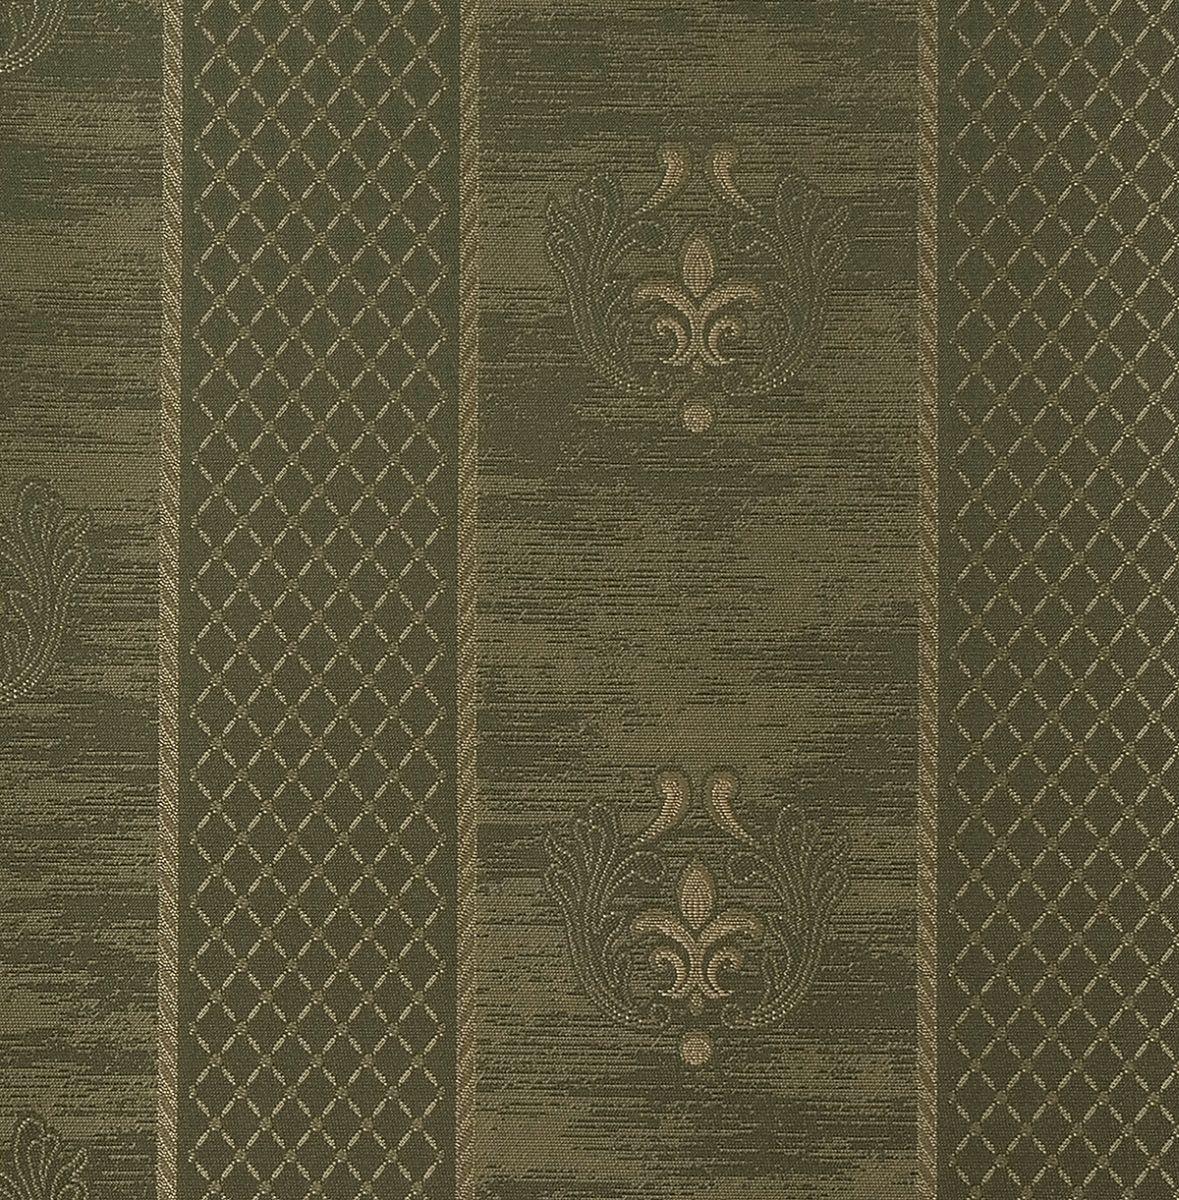 hochwertige tapeten und stoffe stofftapete artemis gr n. Black Bedroom Furniture Sets. Home Design Ideas